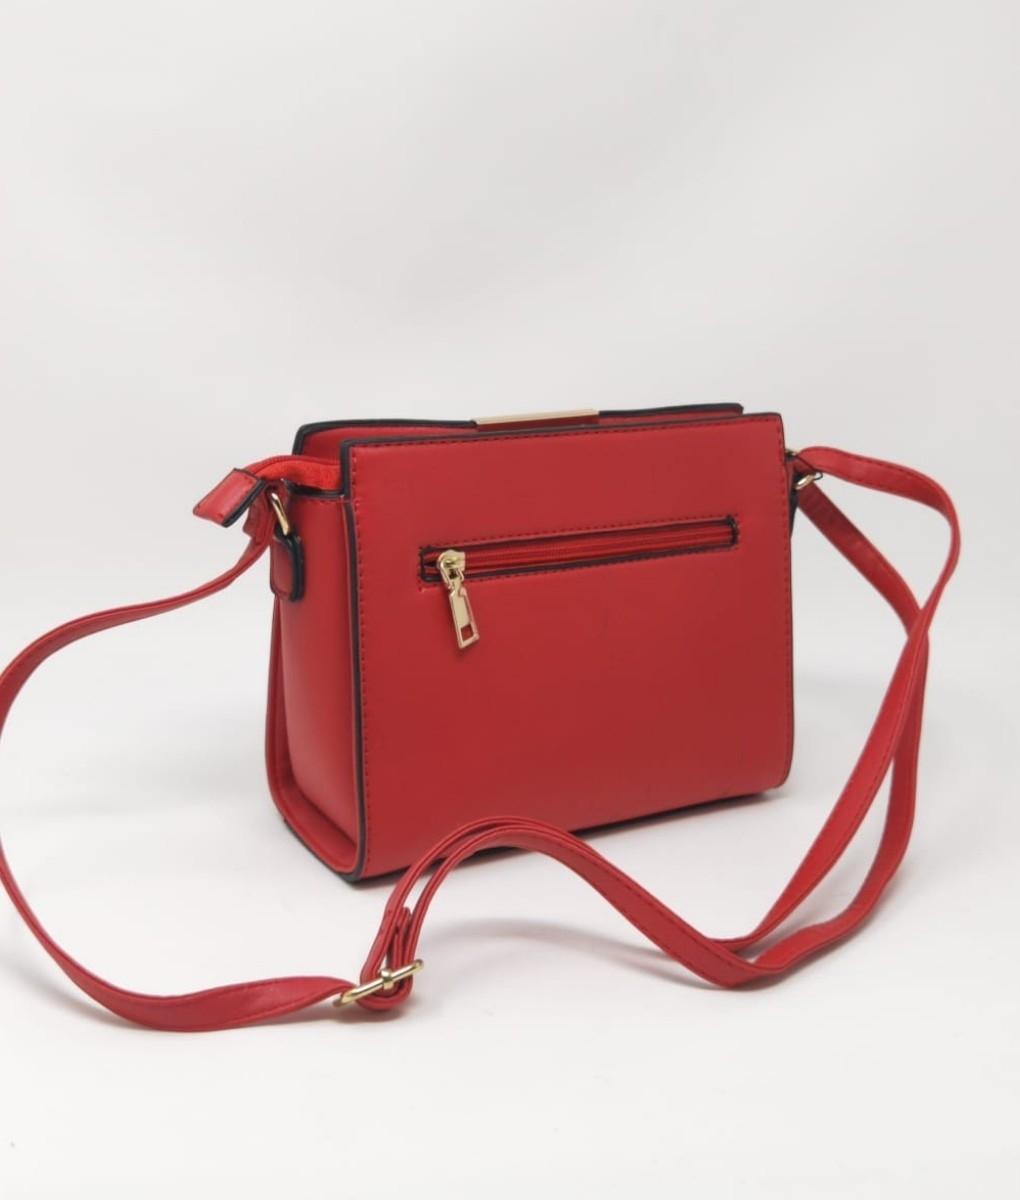 Veva bag - red